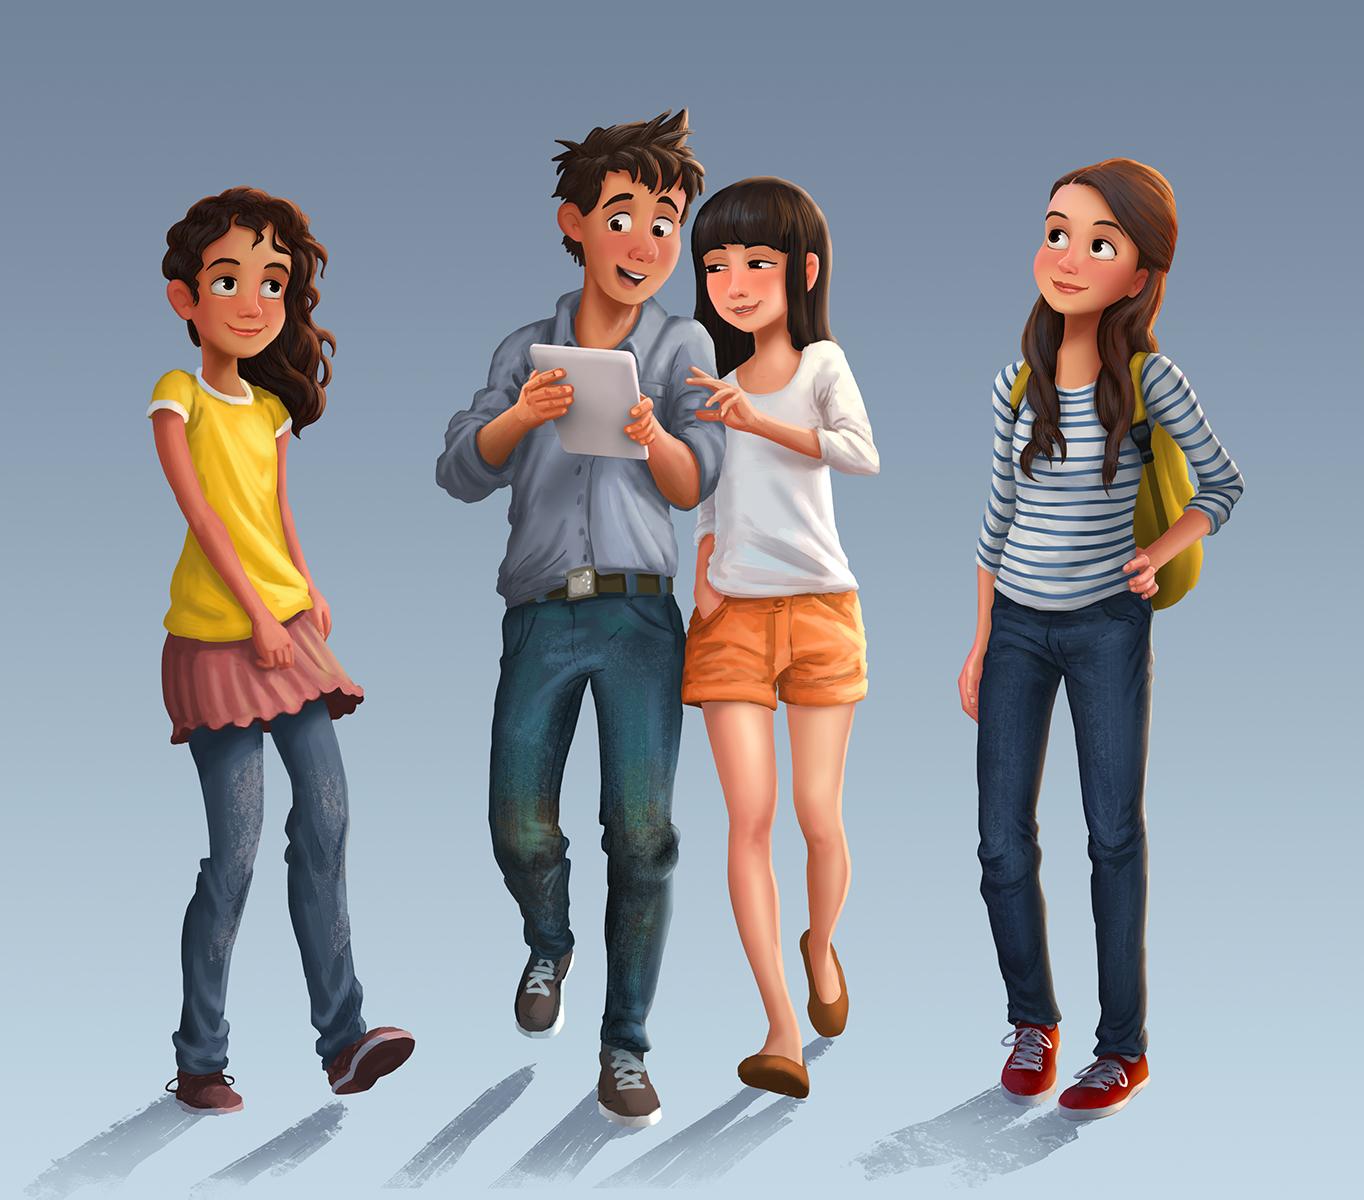 Erwin madrid blog illustrations of teens - Image of teen ...